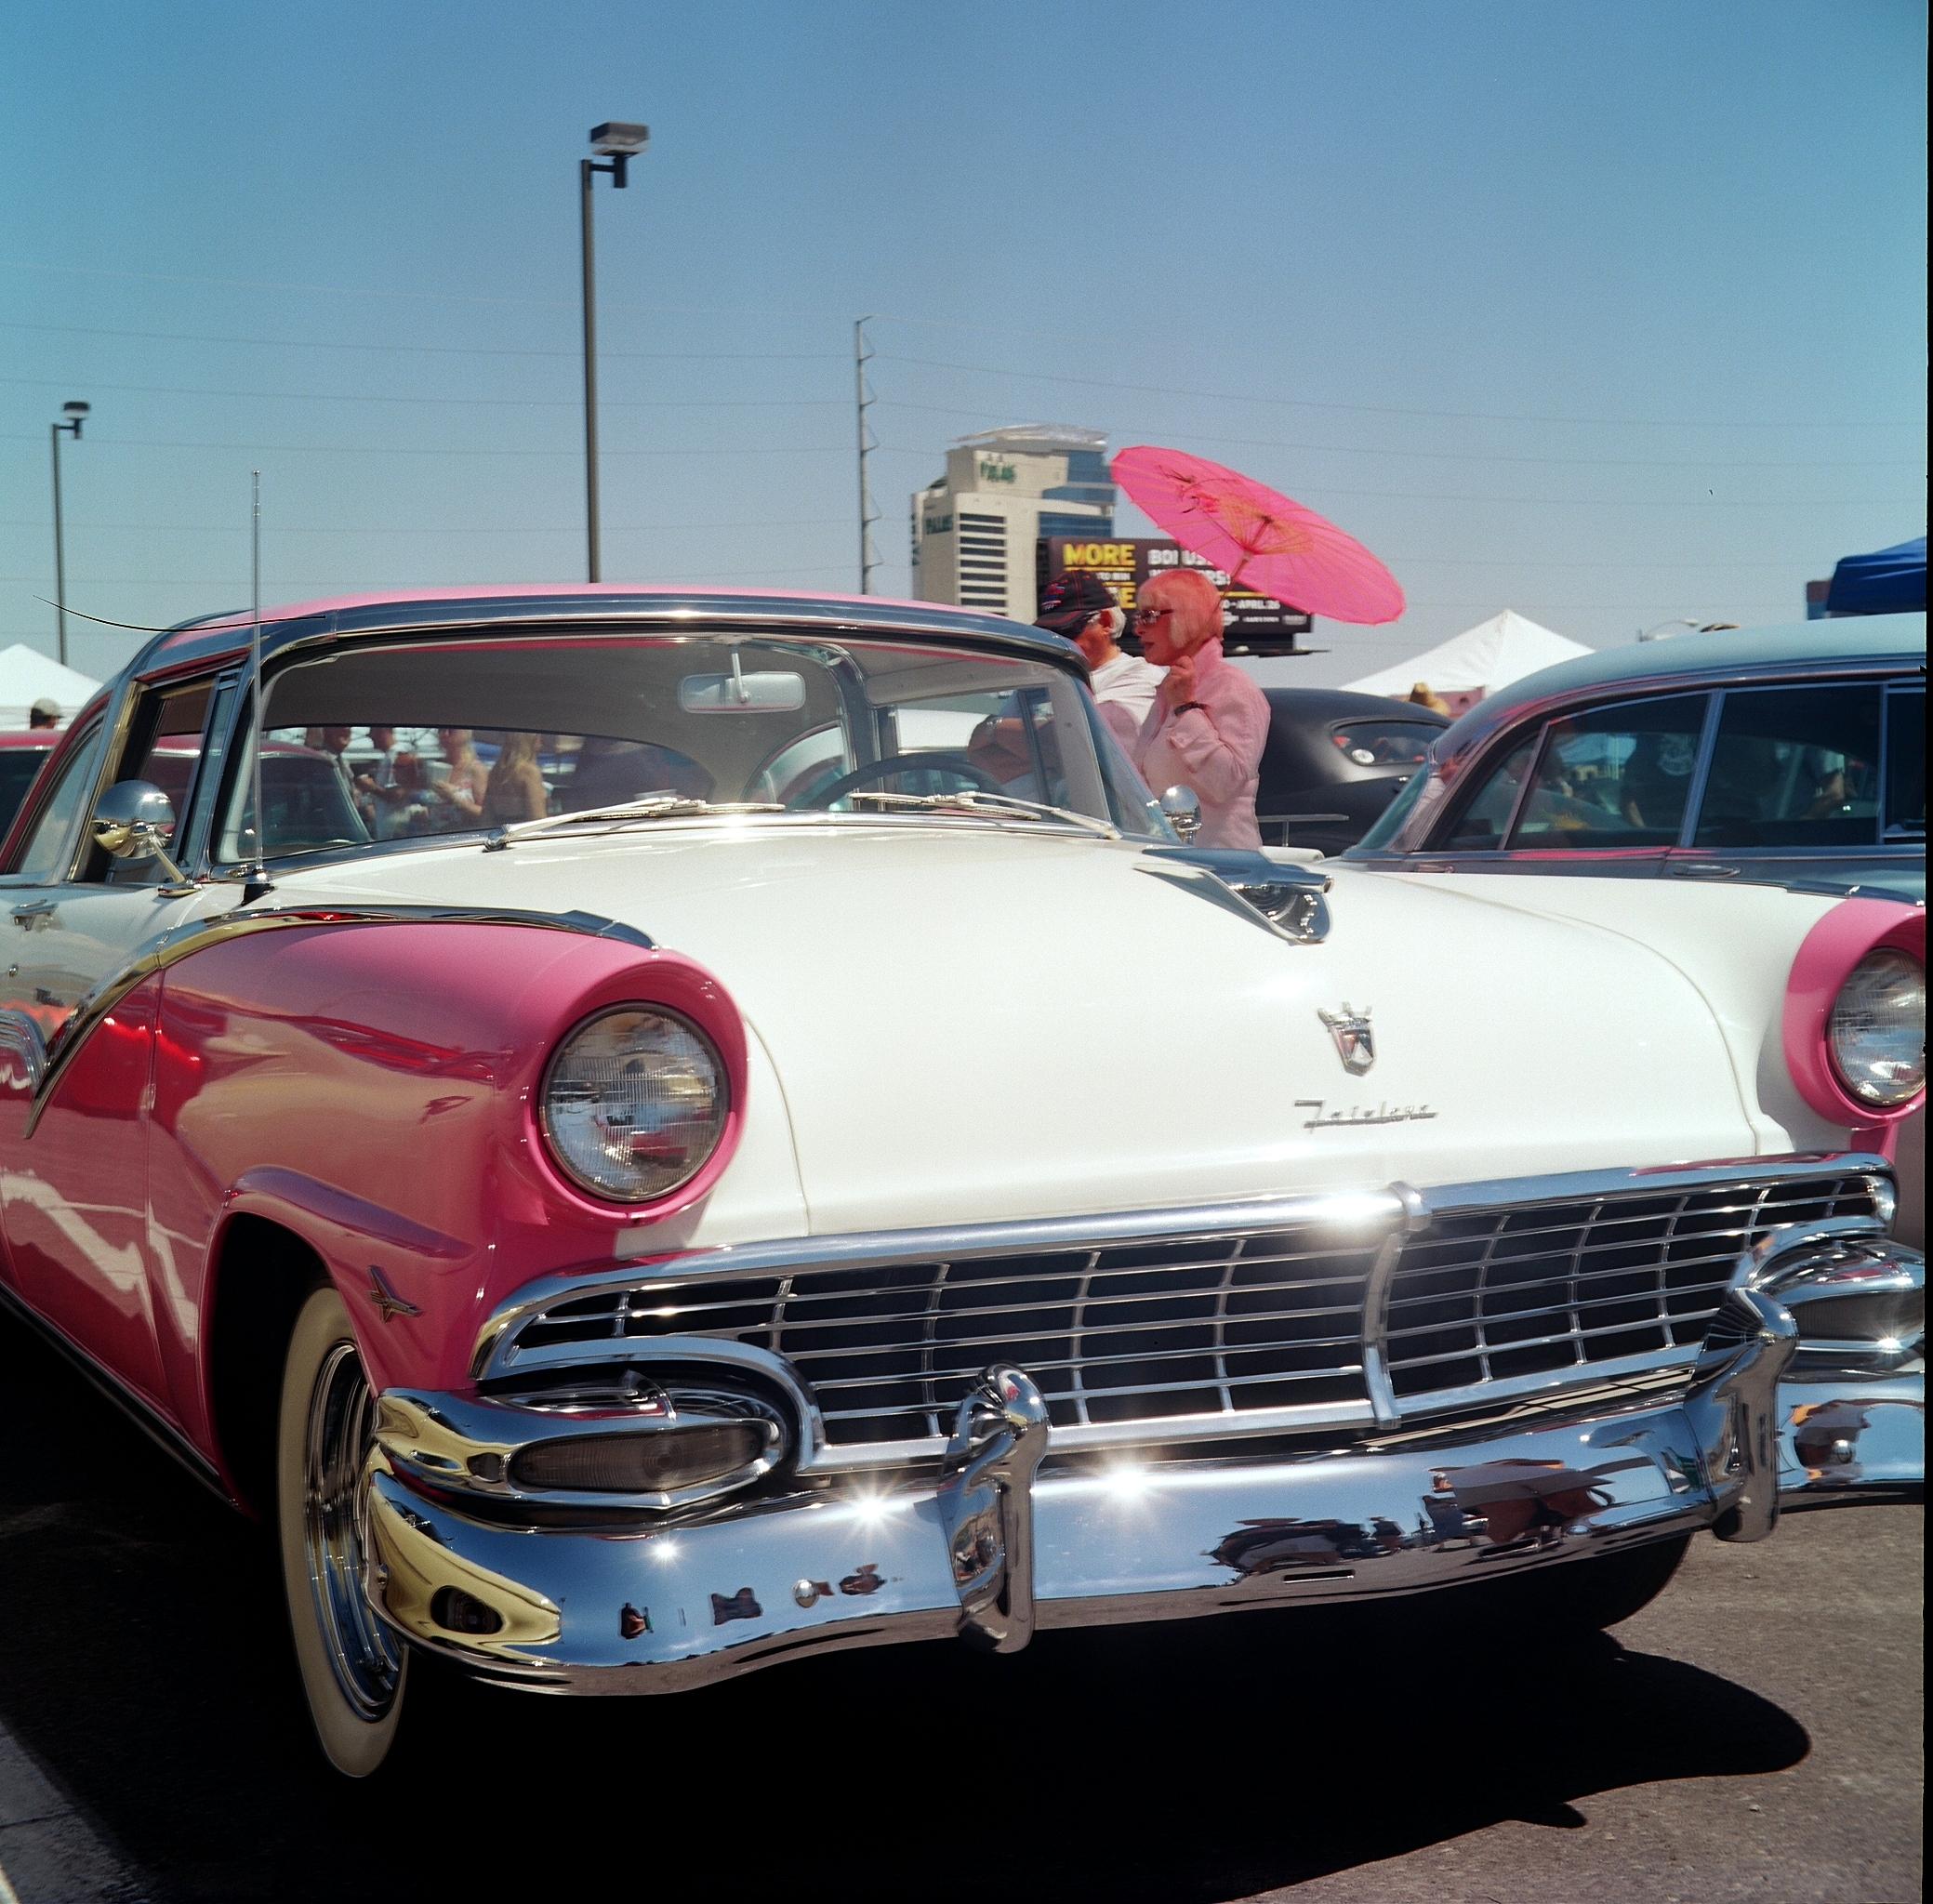 Viva Las Vegas Car Show Medium Format Prints « GatorRock